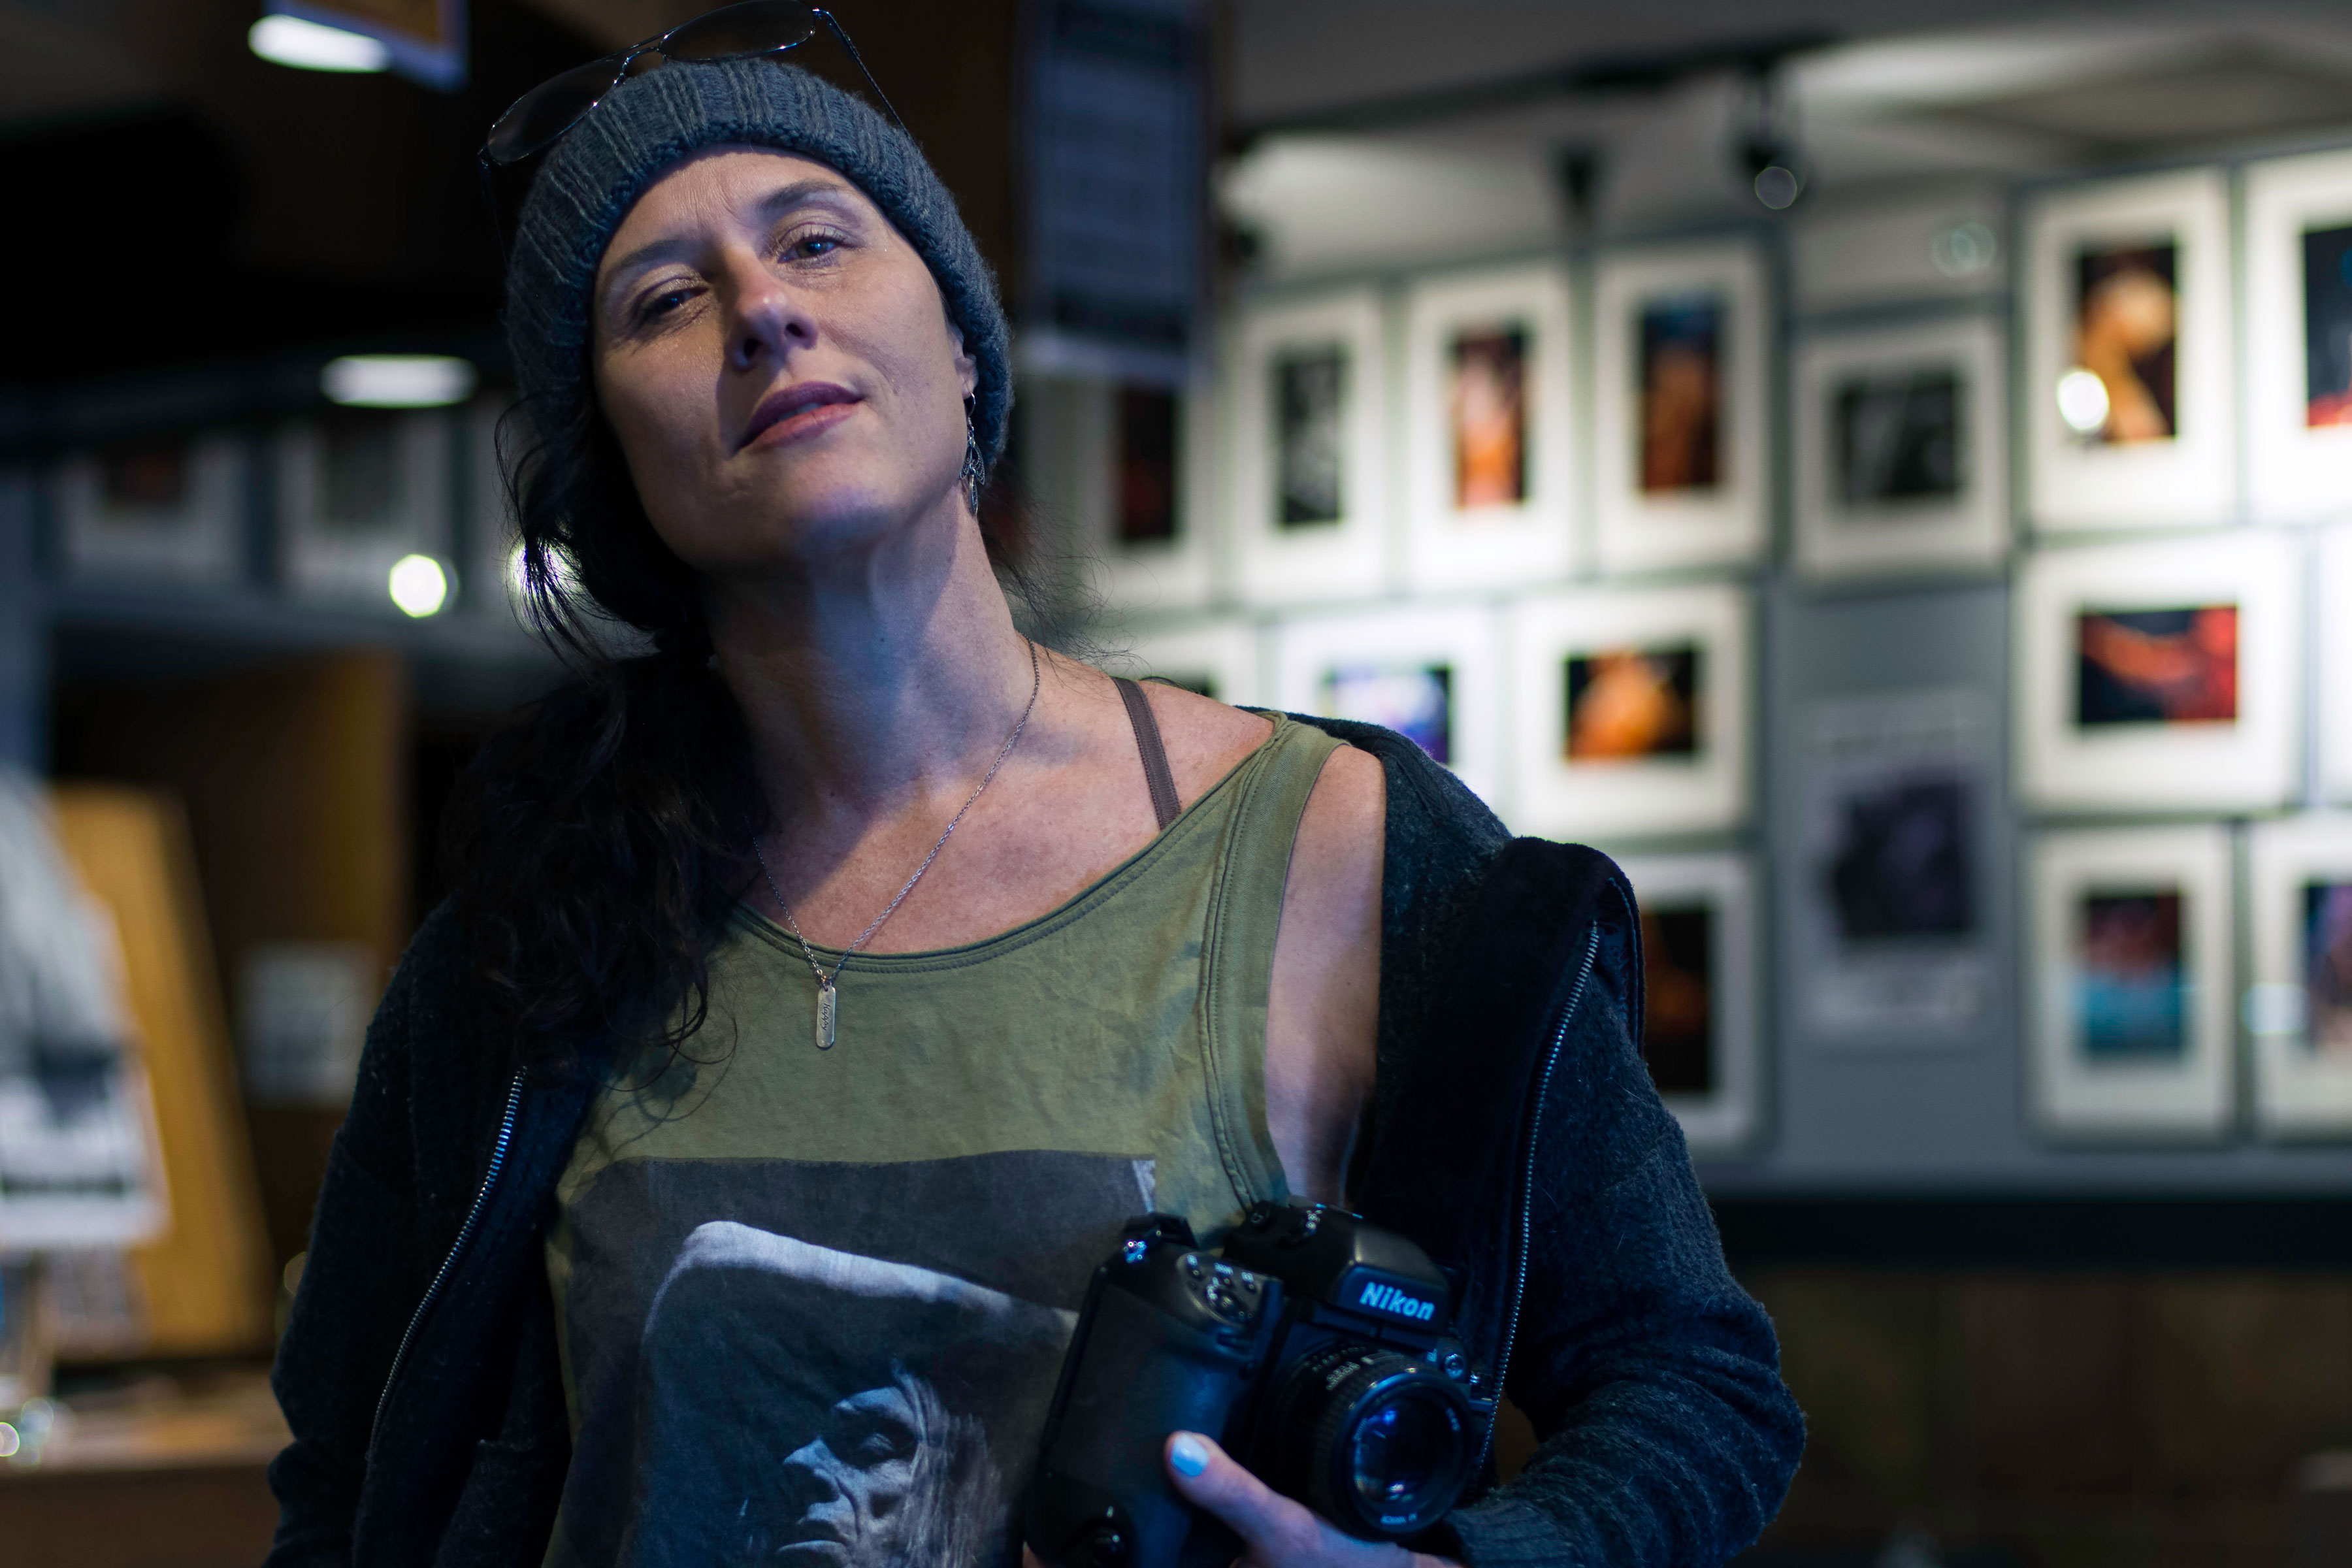 Photo: Fox Theatre at 25-3 | Lisa Siciliano - CJones